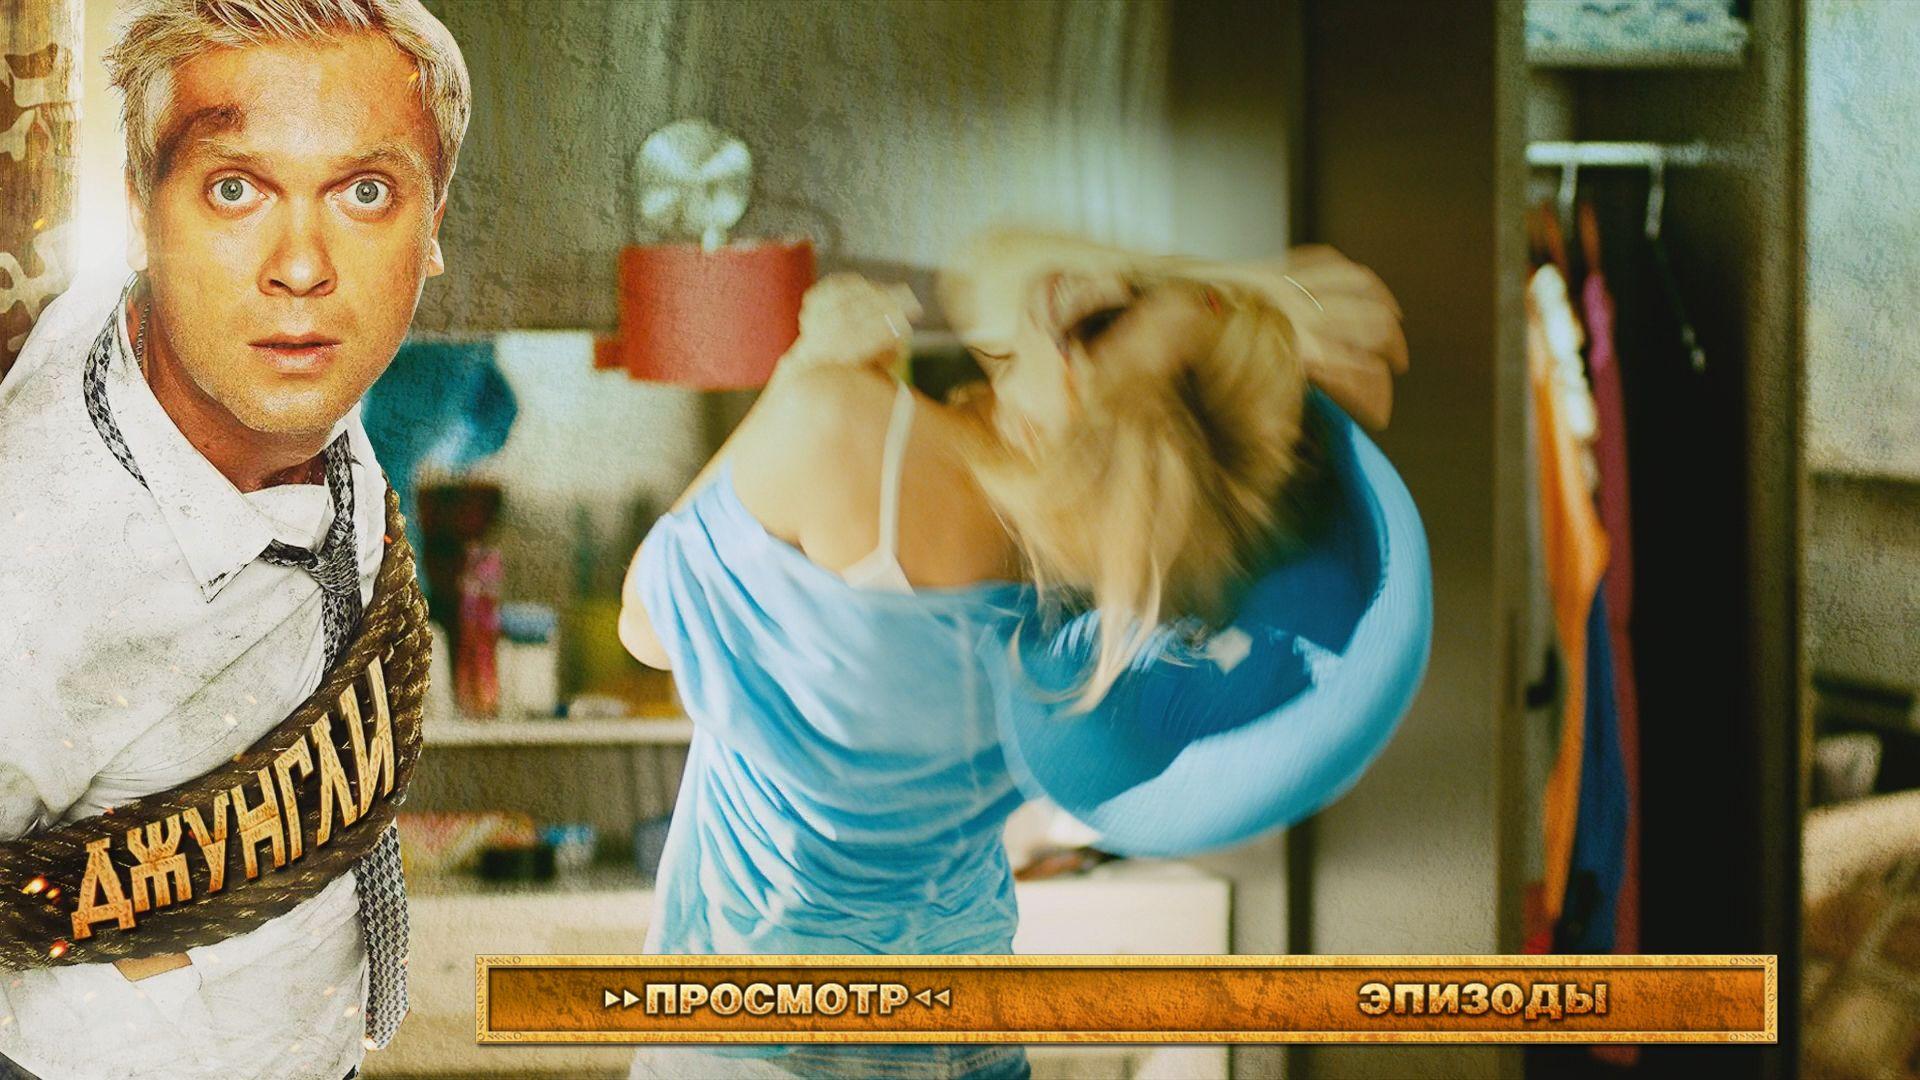 http://i5.imageban.ru/out/2013/01/27/7ec32b085b45fbb3c663510c126f60d5.jpg